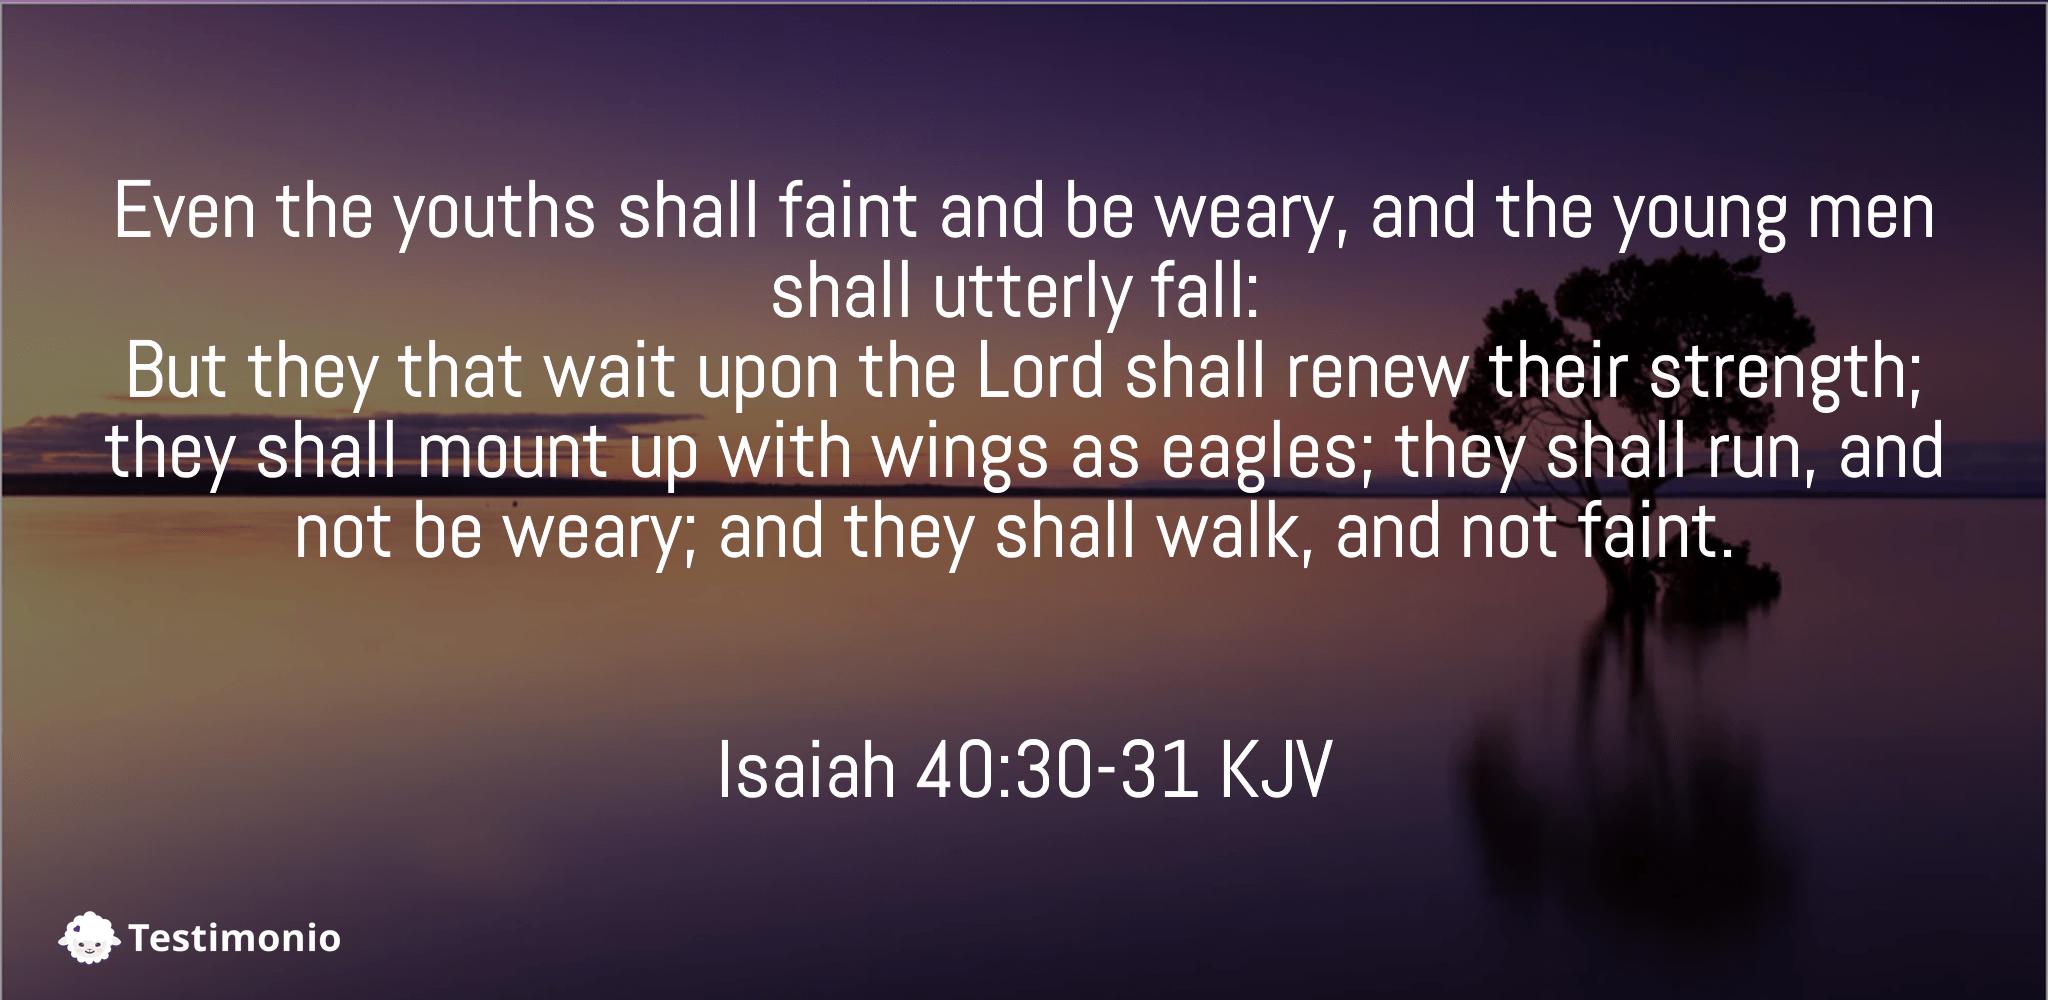 Isaiah 40:30-31